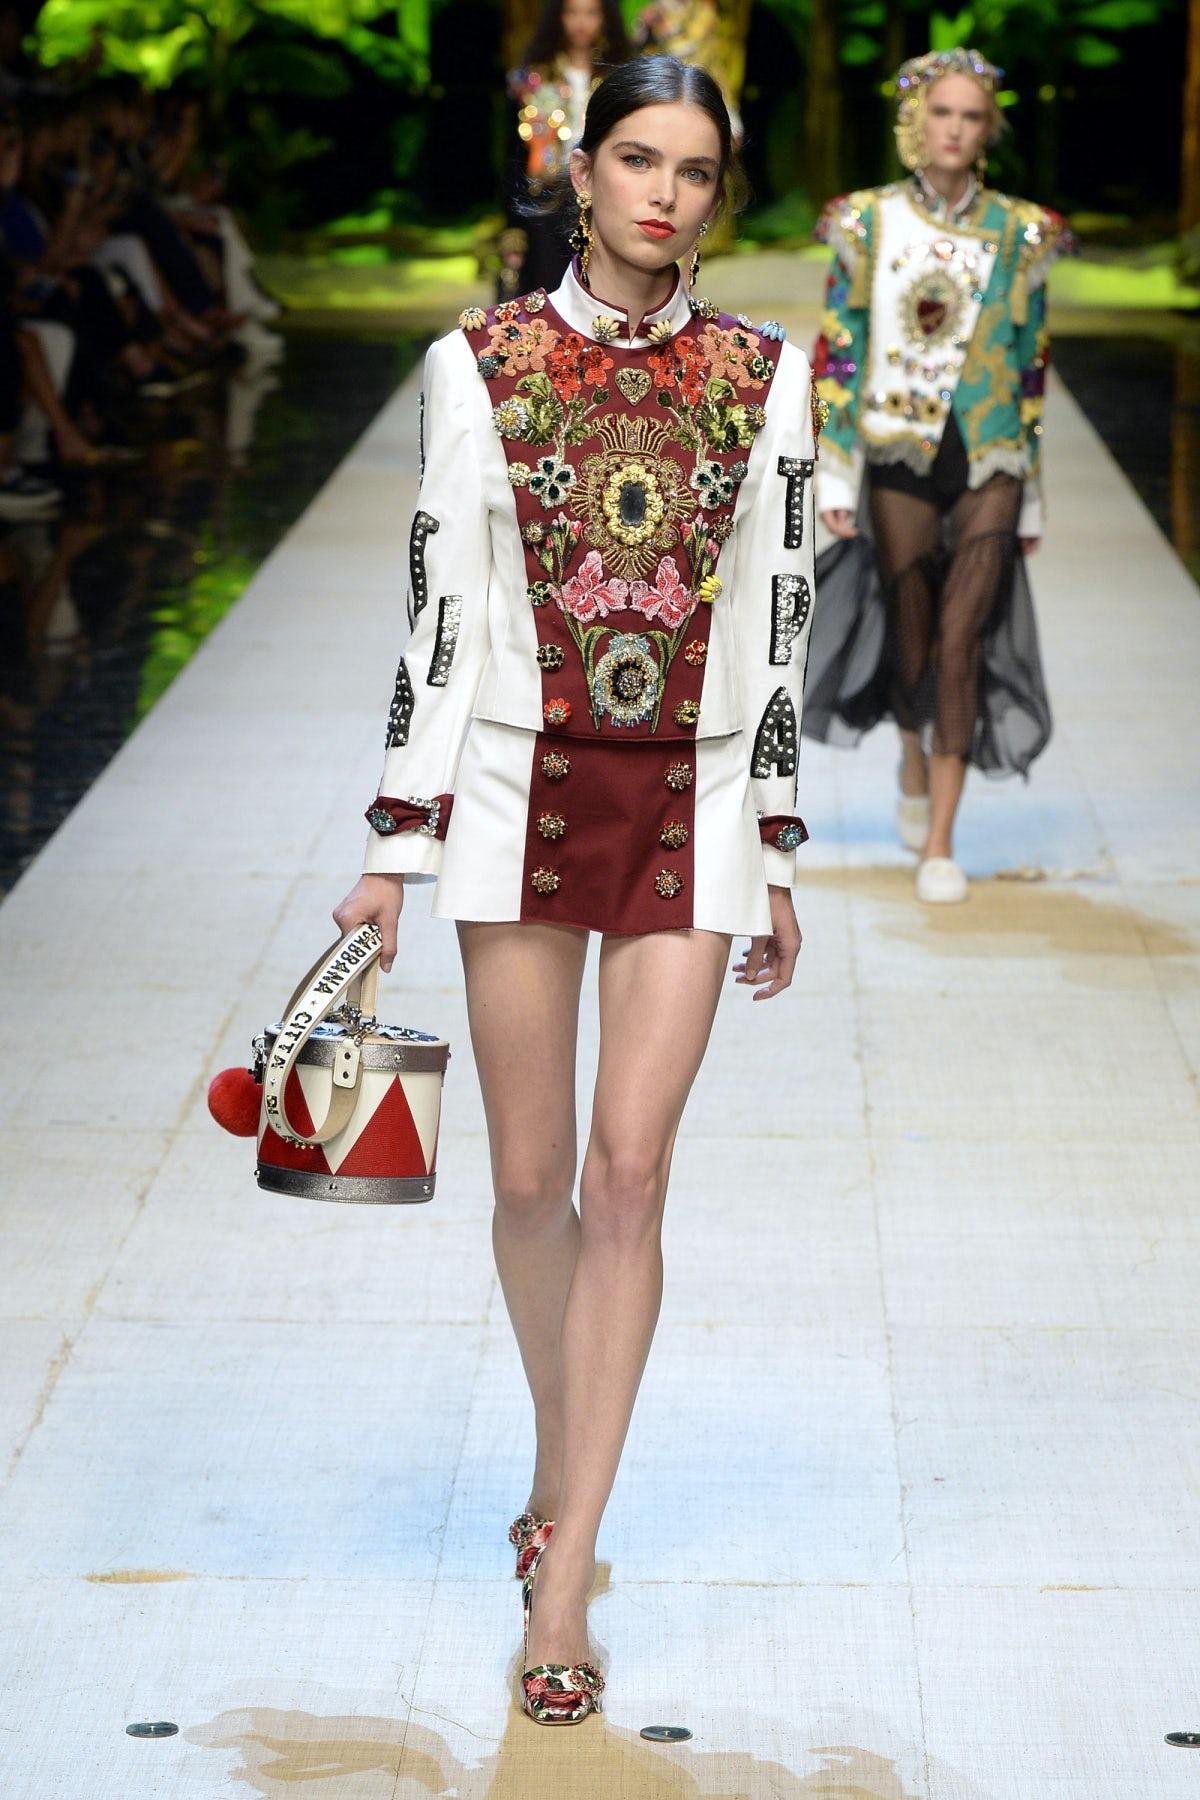 Dolce and Gabbana Spring/Summer 2017 | Source: InDigital.tv